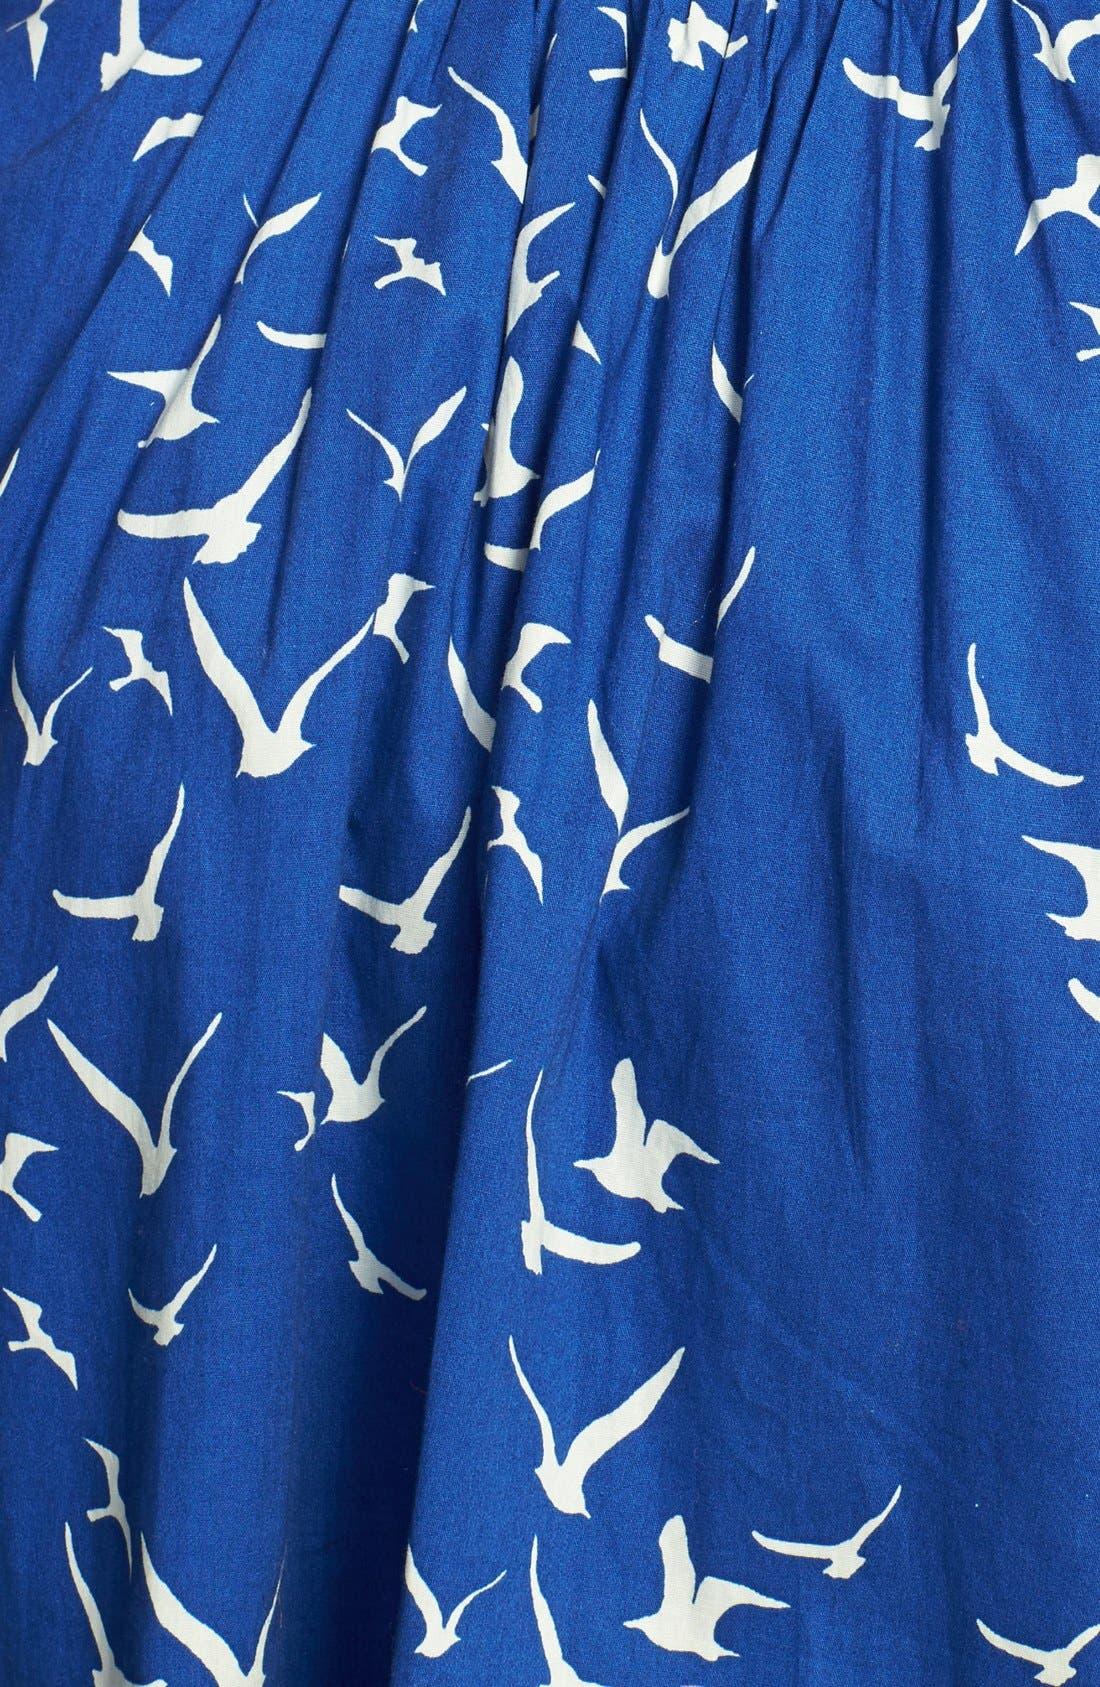 Alternate Image 3  - City Chic 'Seaside' Fit & Flare Dress (Plus Size)